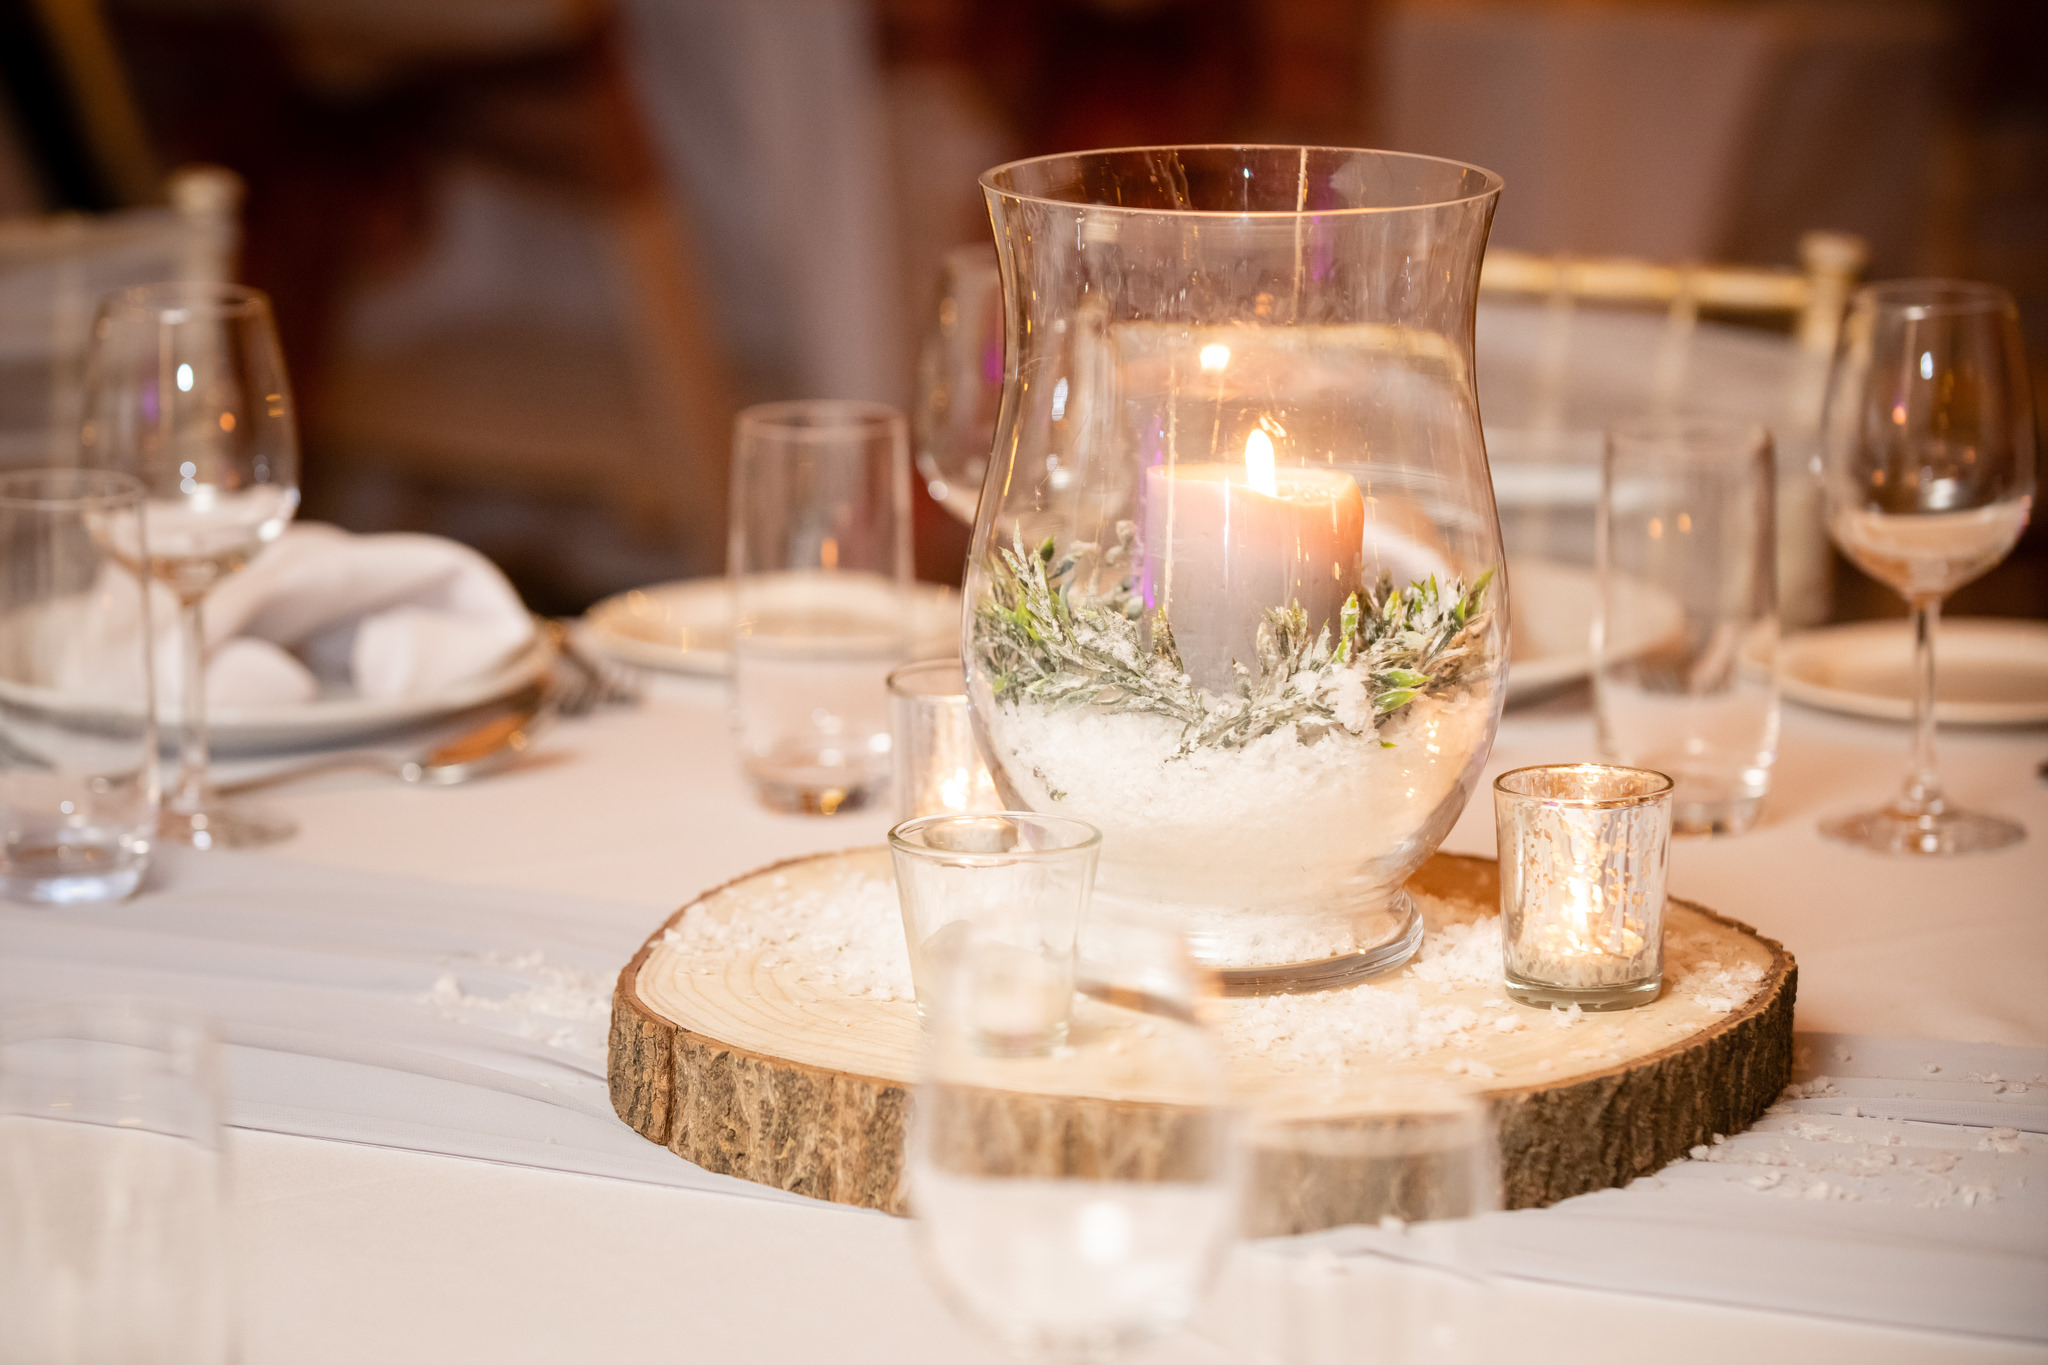 Table decor for a tipi wedding